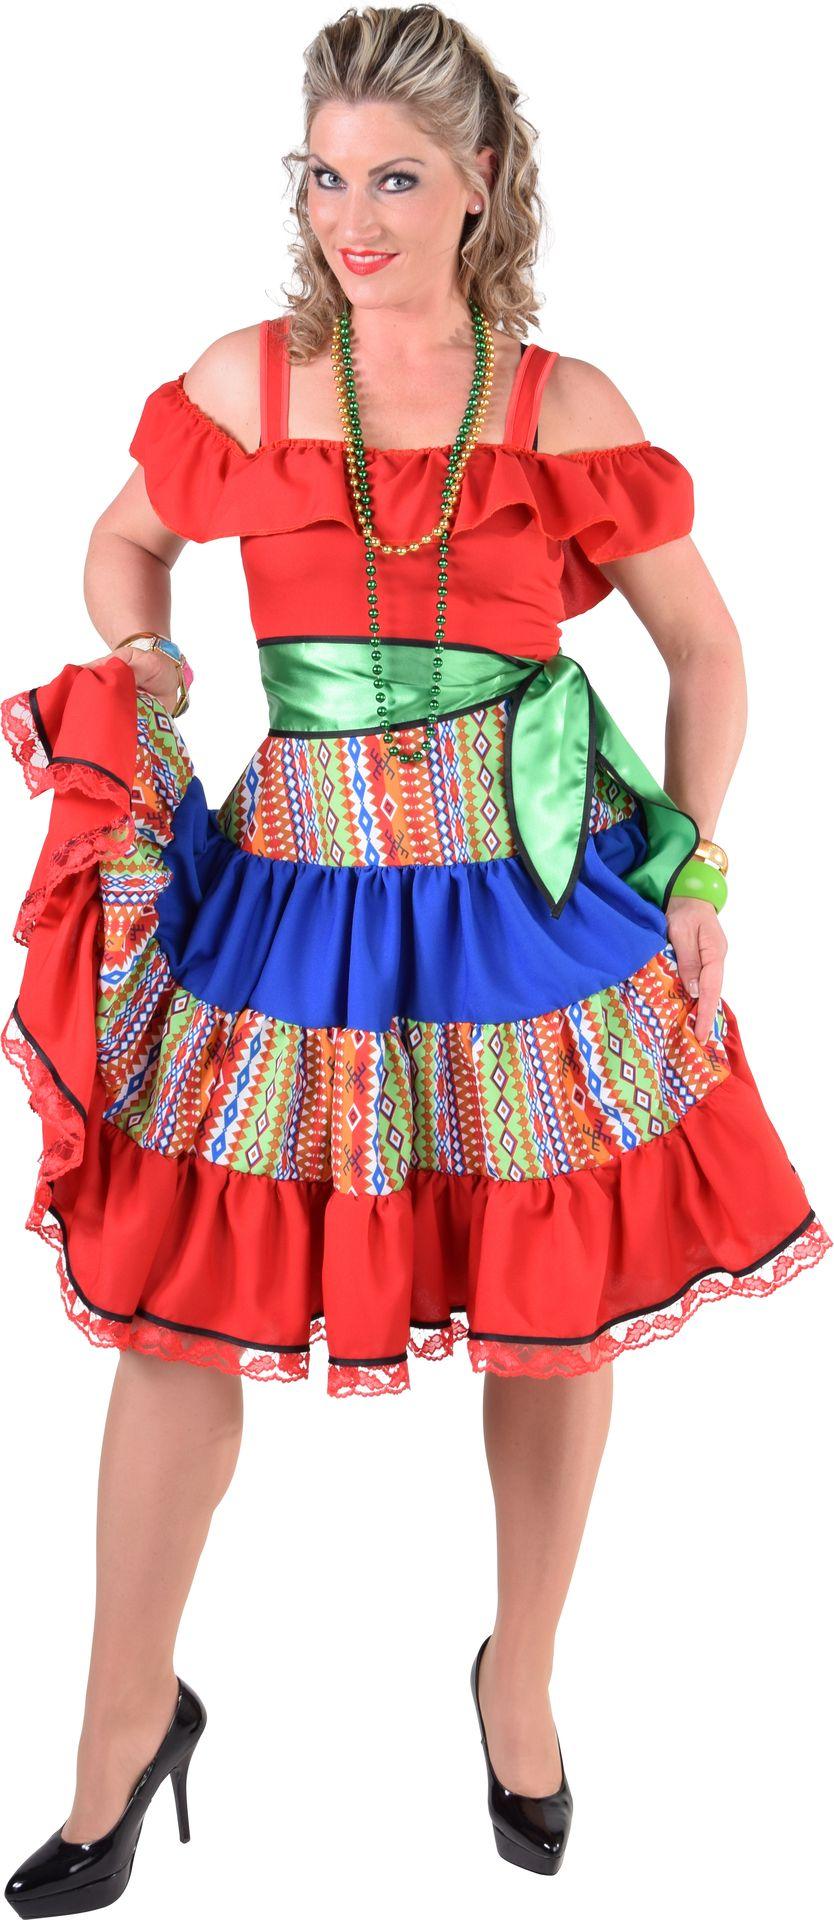 Jurkje Mexico dames